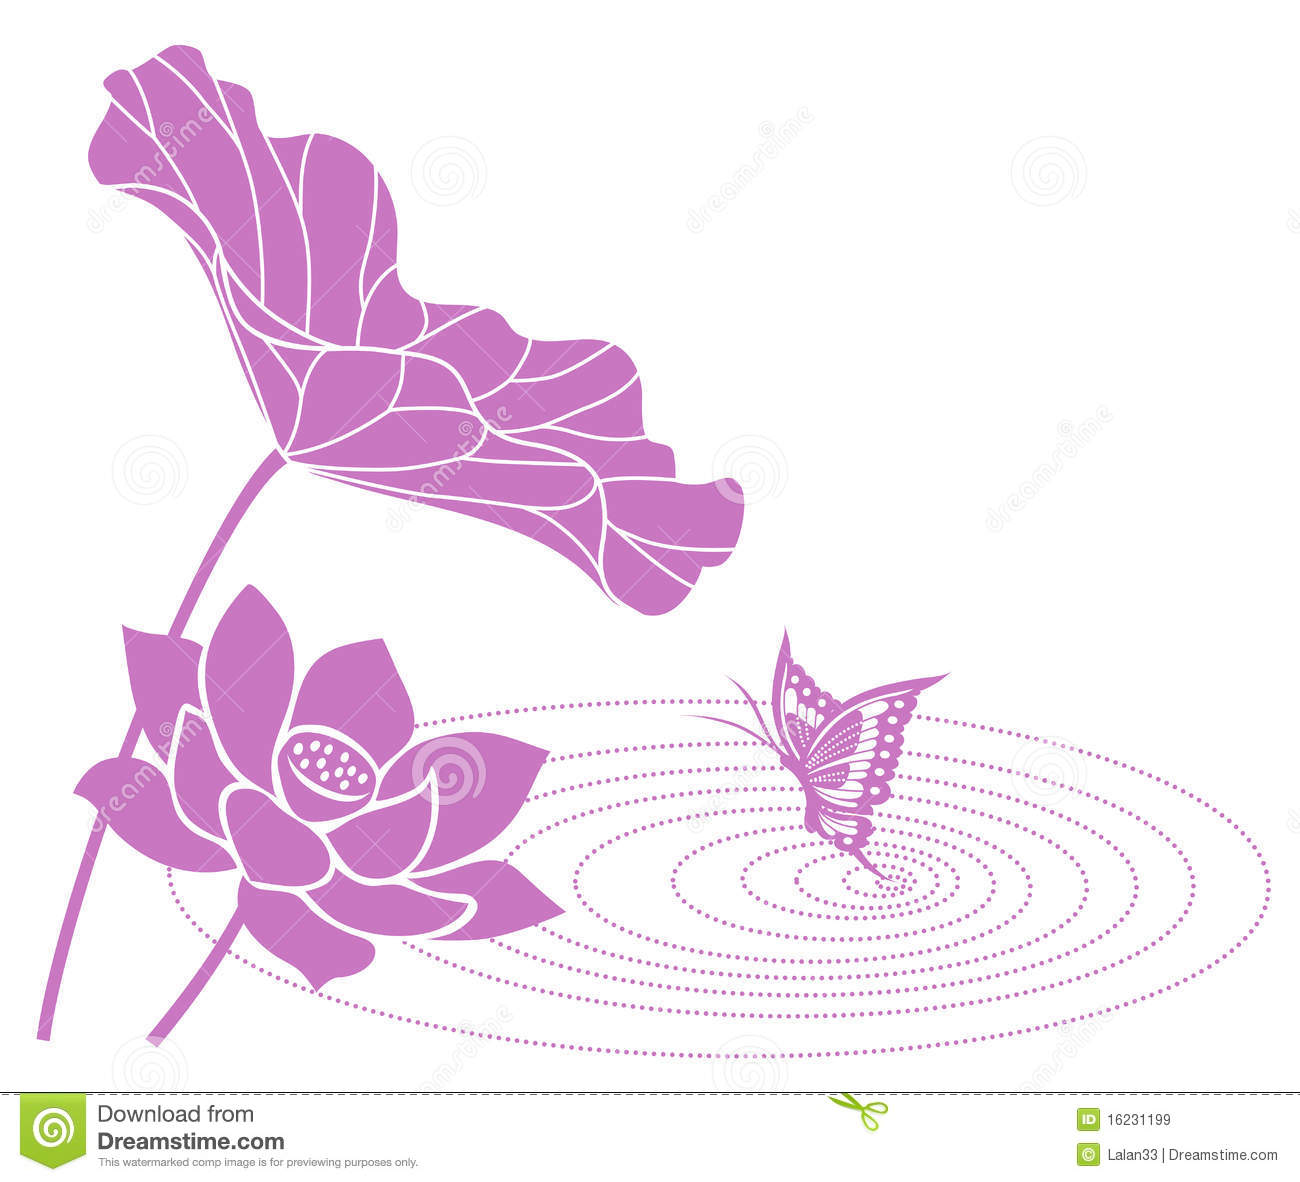 Lotus Flower Royalty Free Stock Images.